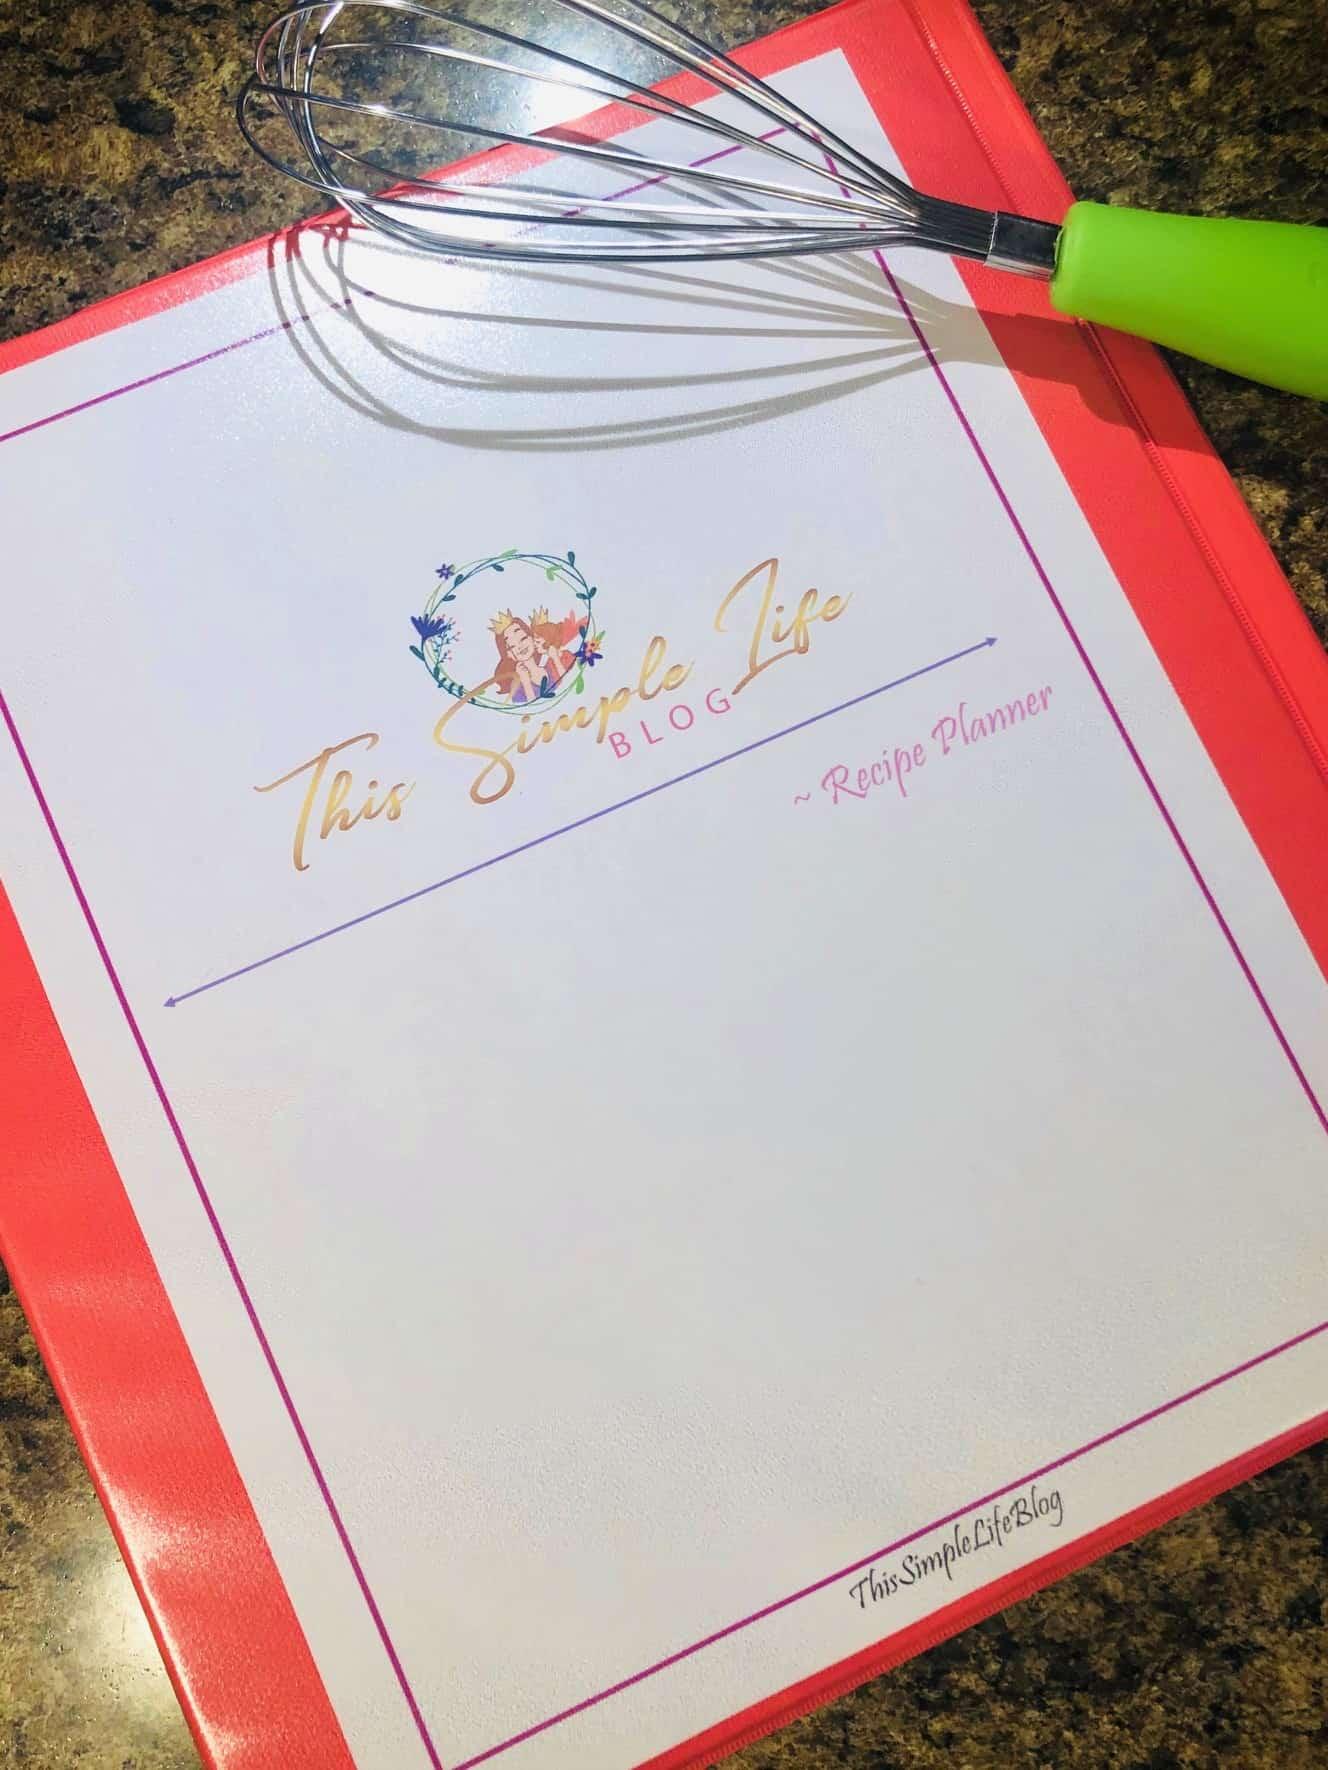 This Simple Life Recipe Planner